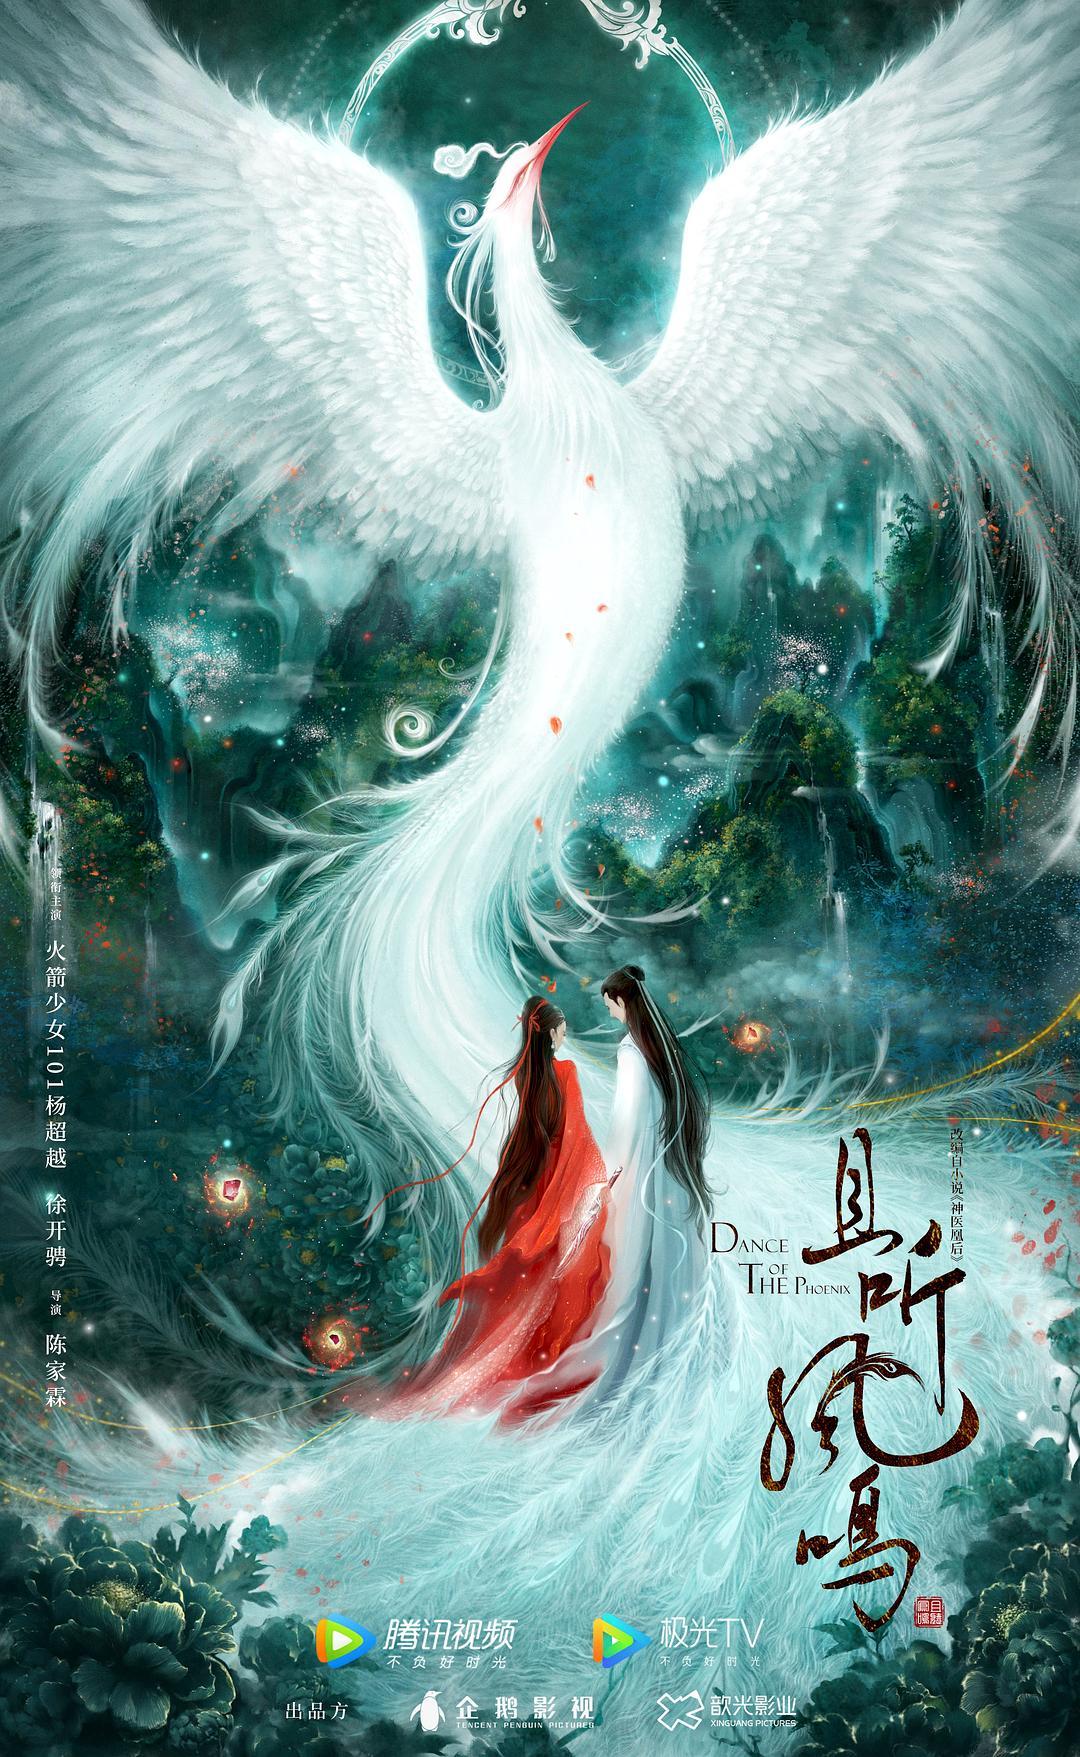 Dance of the Phoenix (S01)